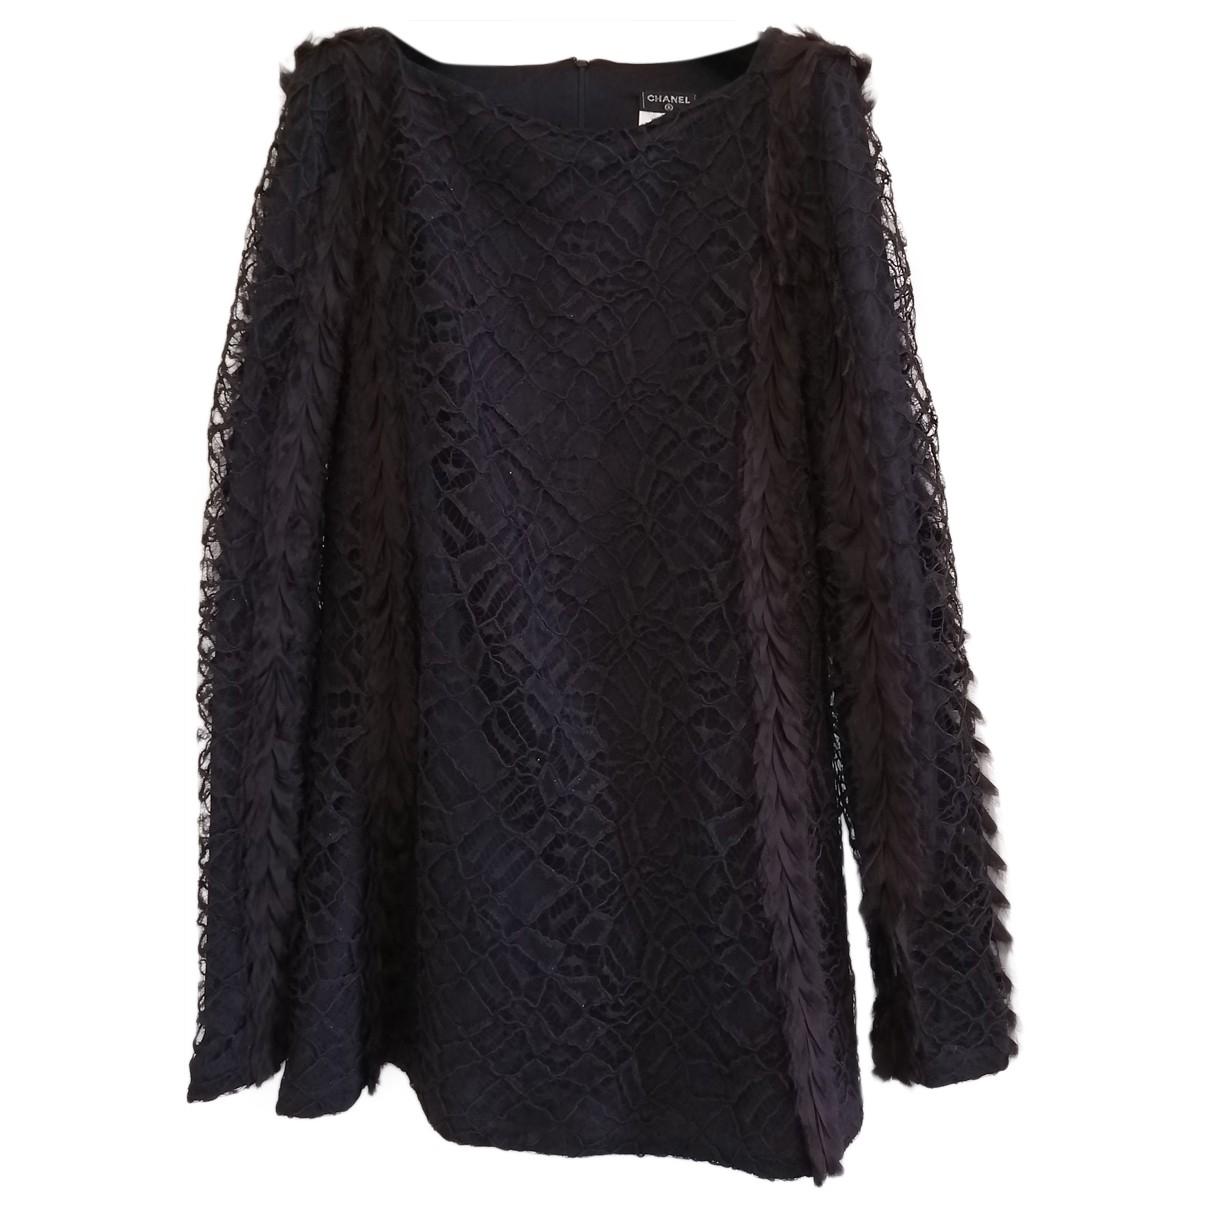 Chanel - Robe   pour femme en dentelle - violet